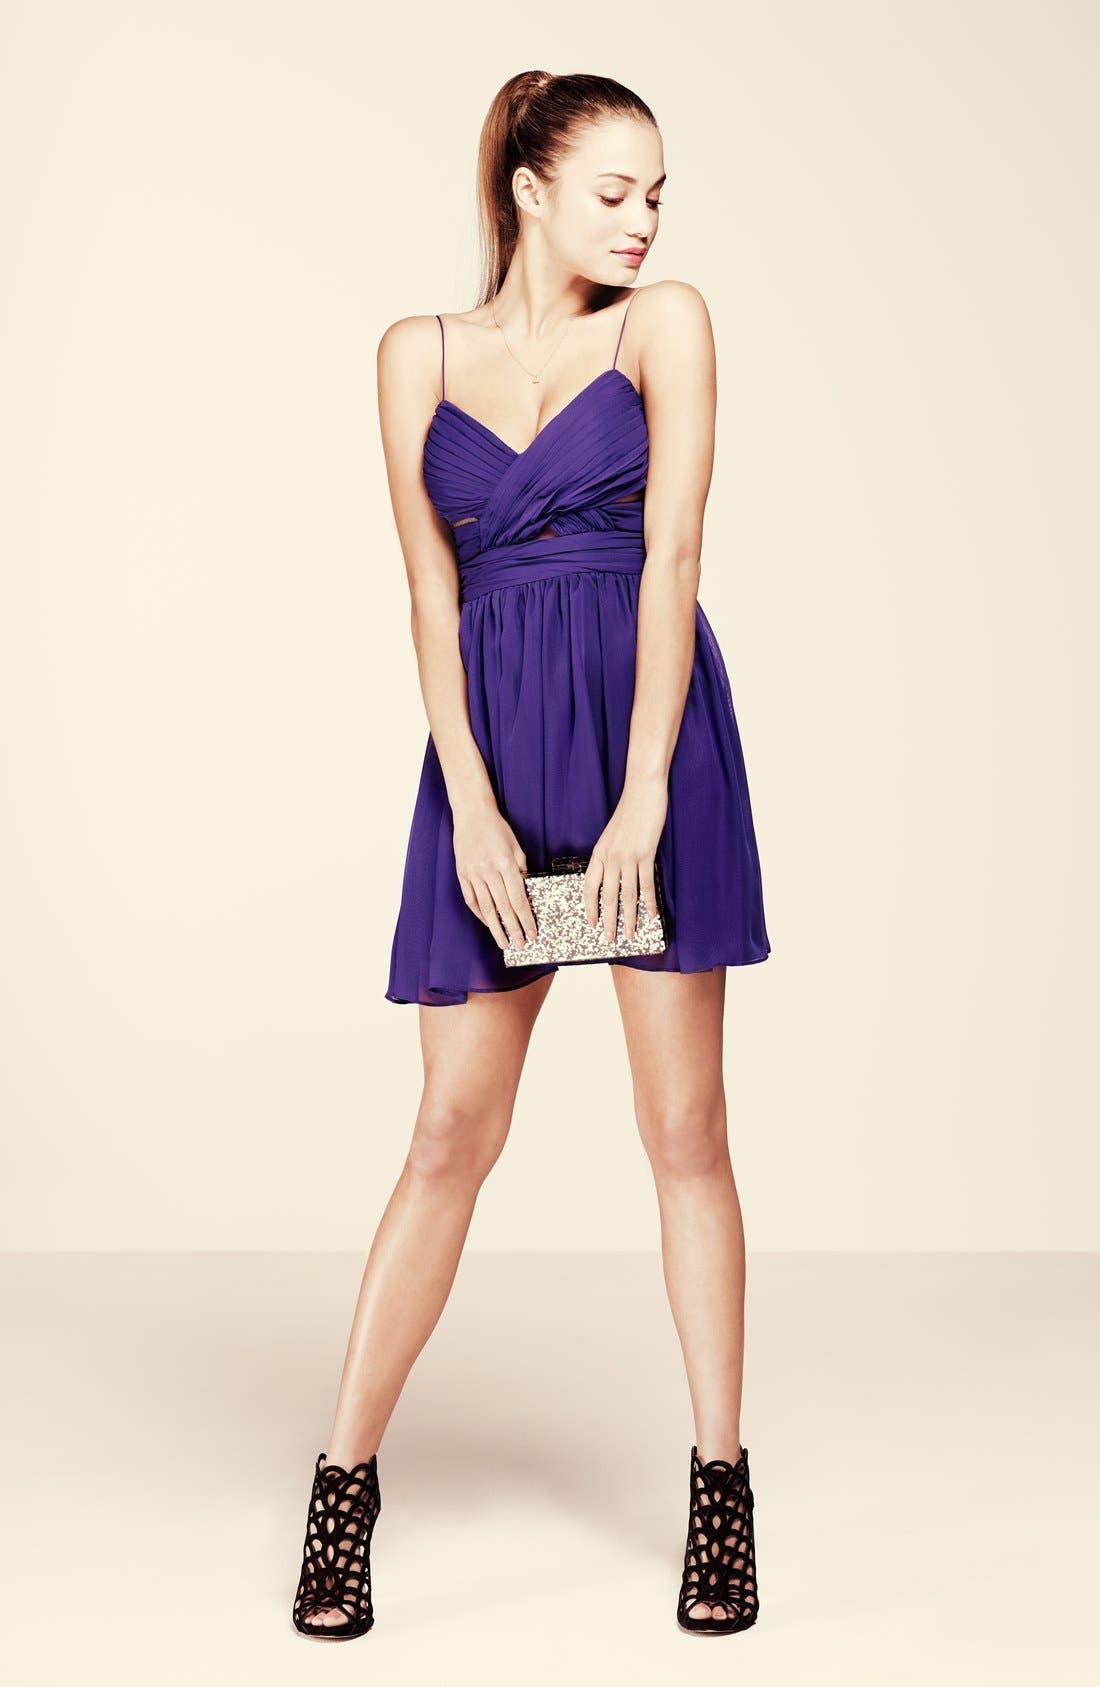 Main Image - Hailey Logan Dress & Accessories